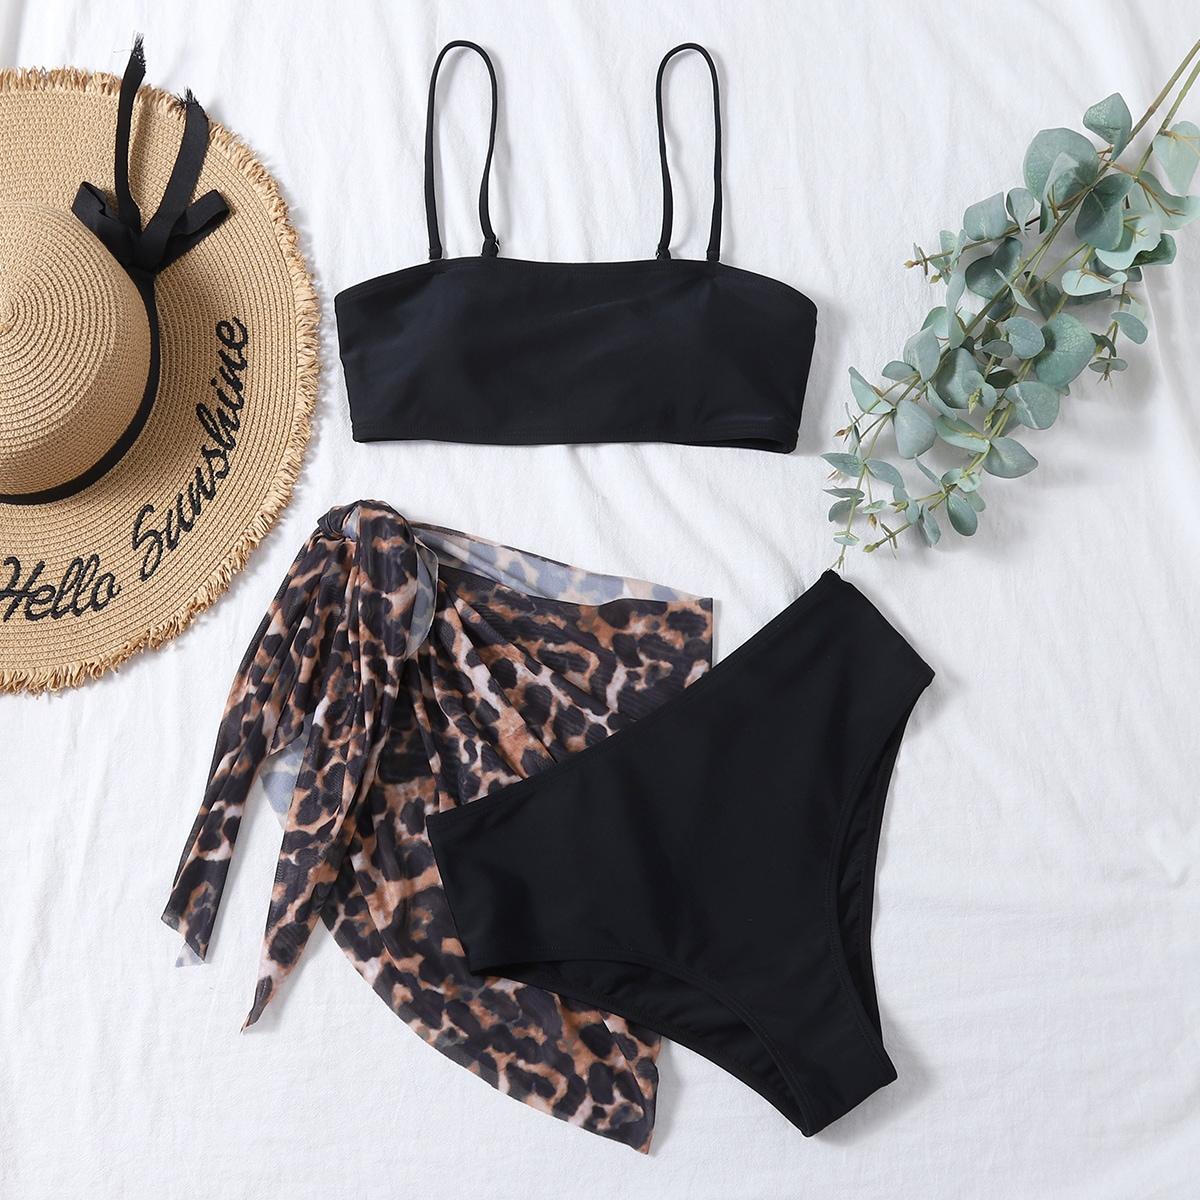 SHEIN / 3pack Solid Bikini Swimsuit & Leopard Beach Skirt